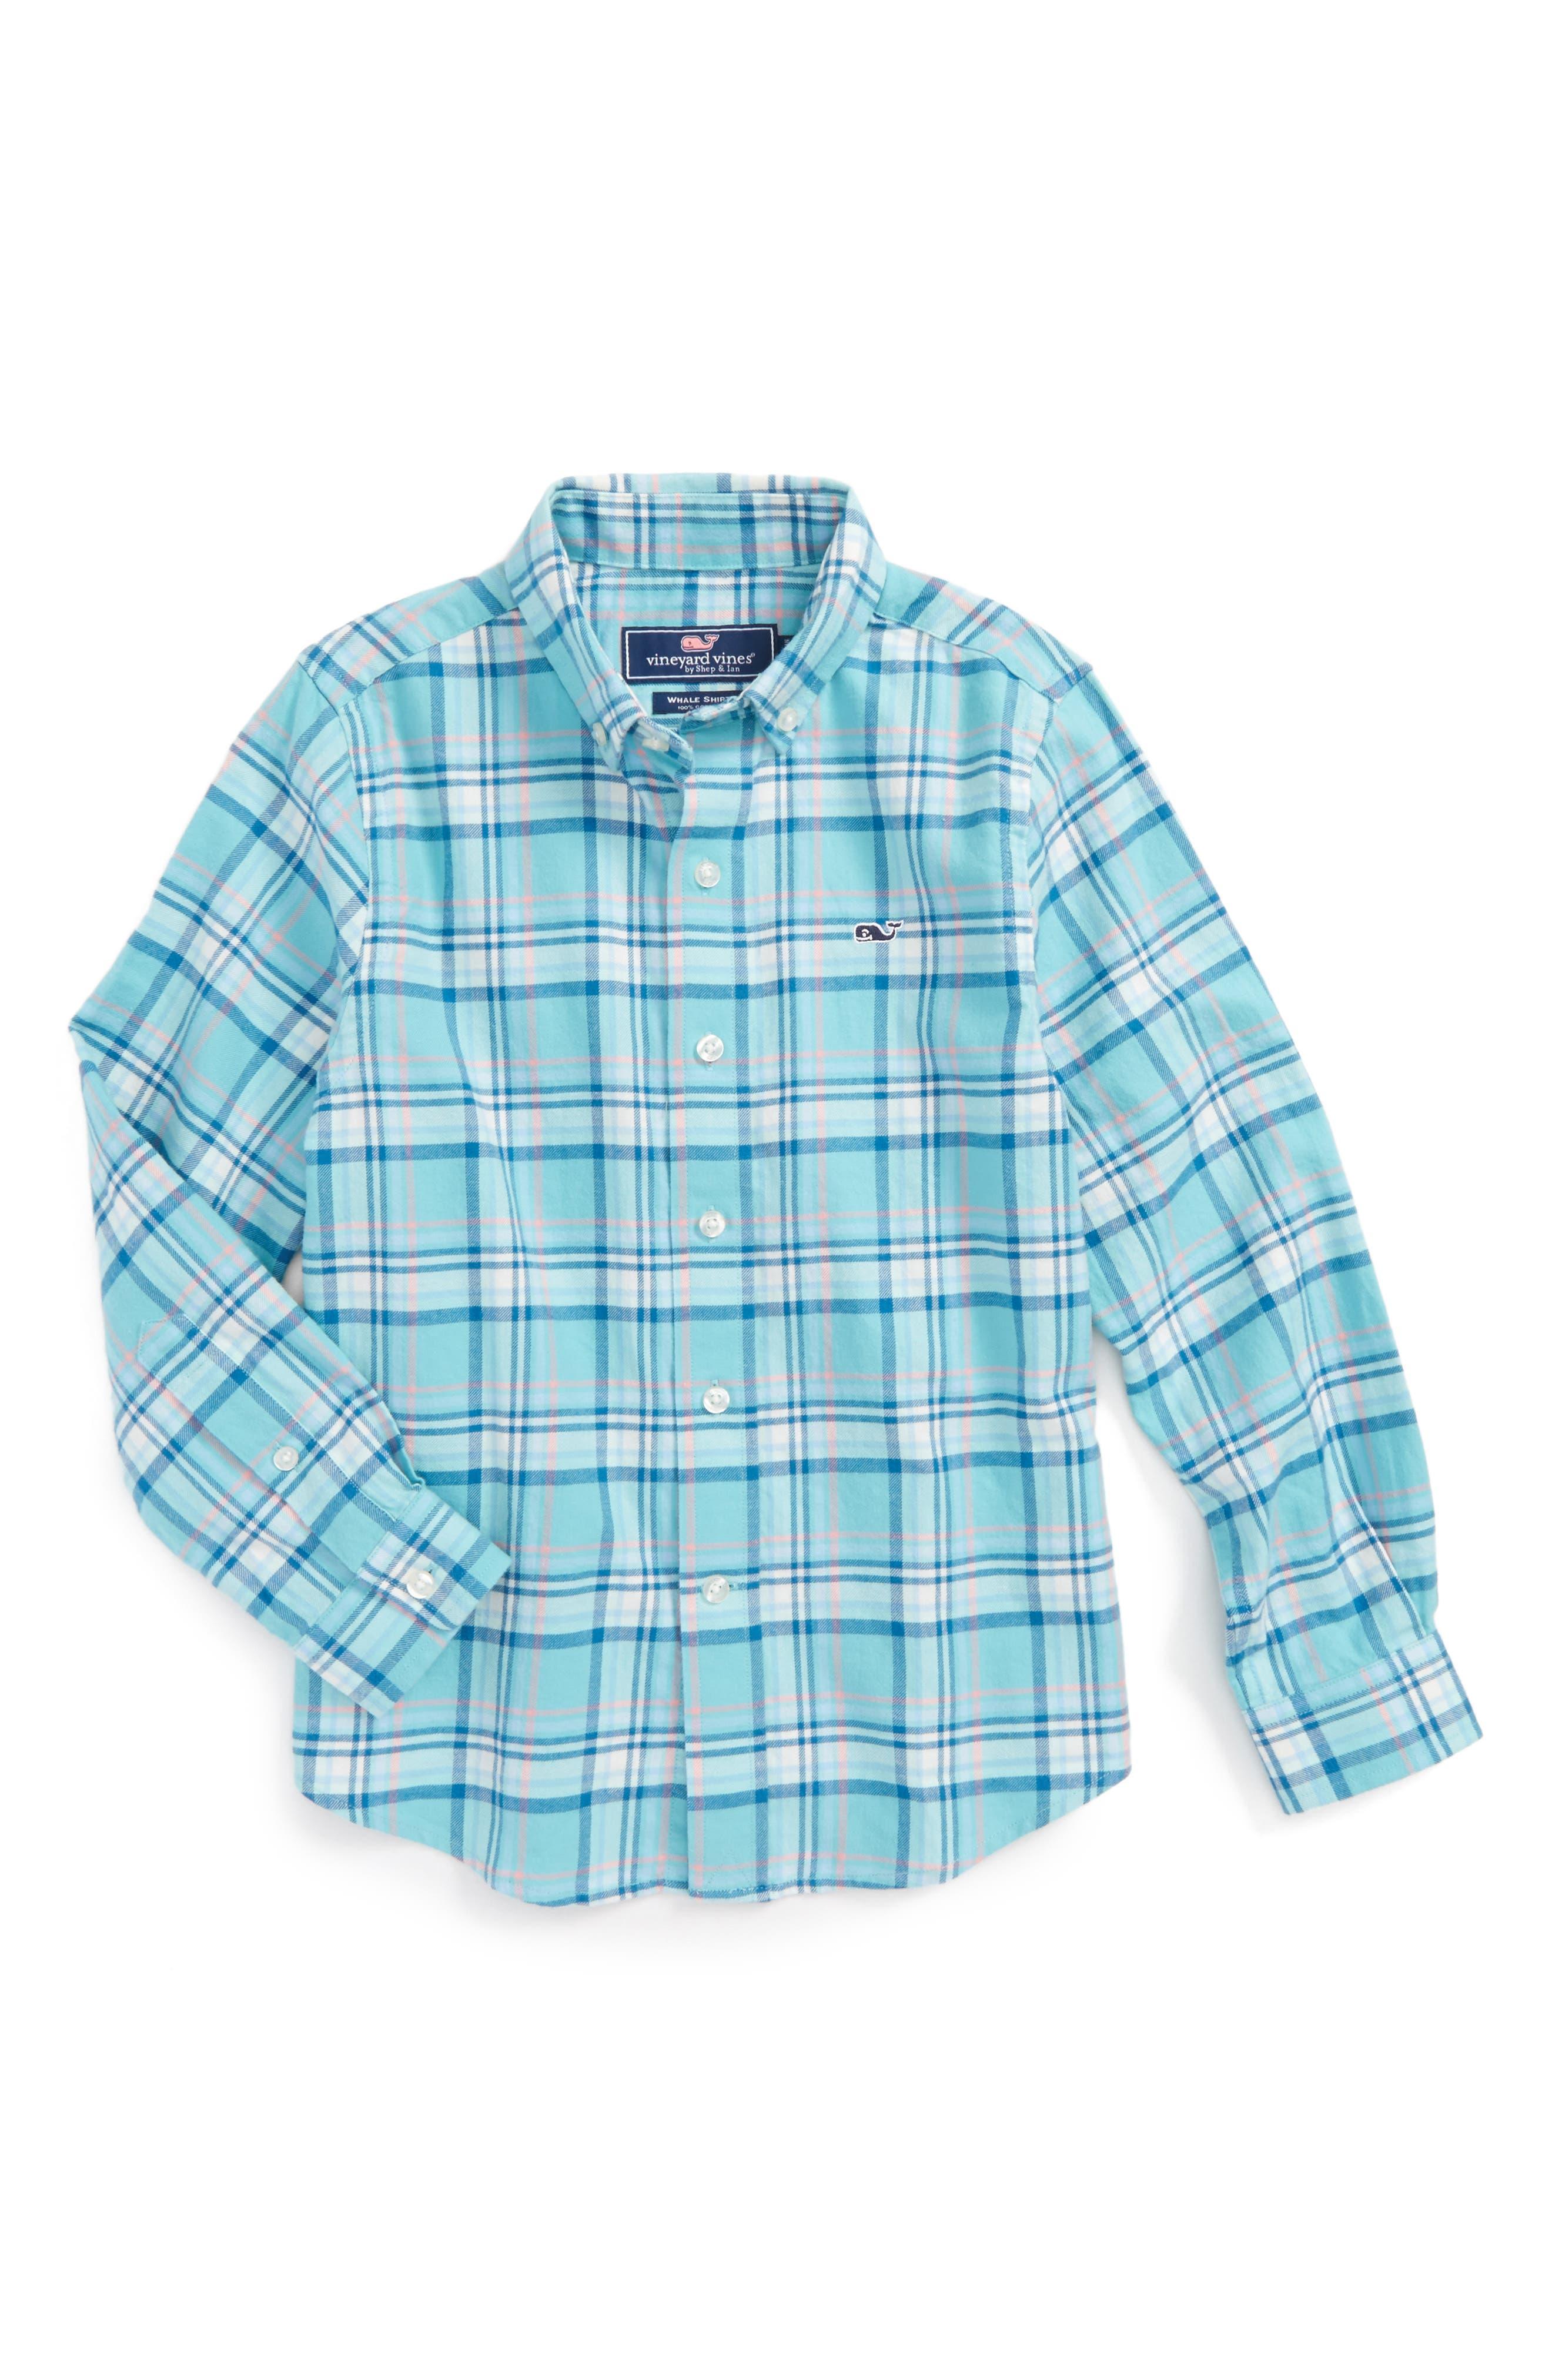 Vineyard Vines Loblolly Plaid Shirt (Toddler Boys & Little Boys)